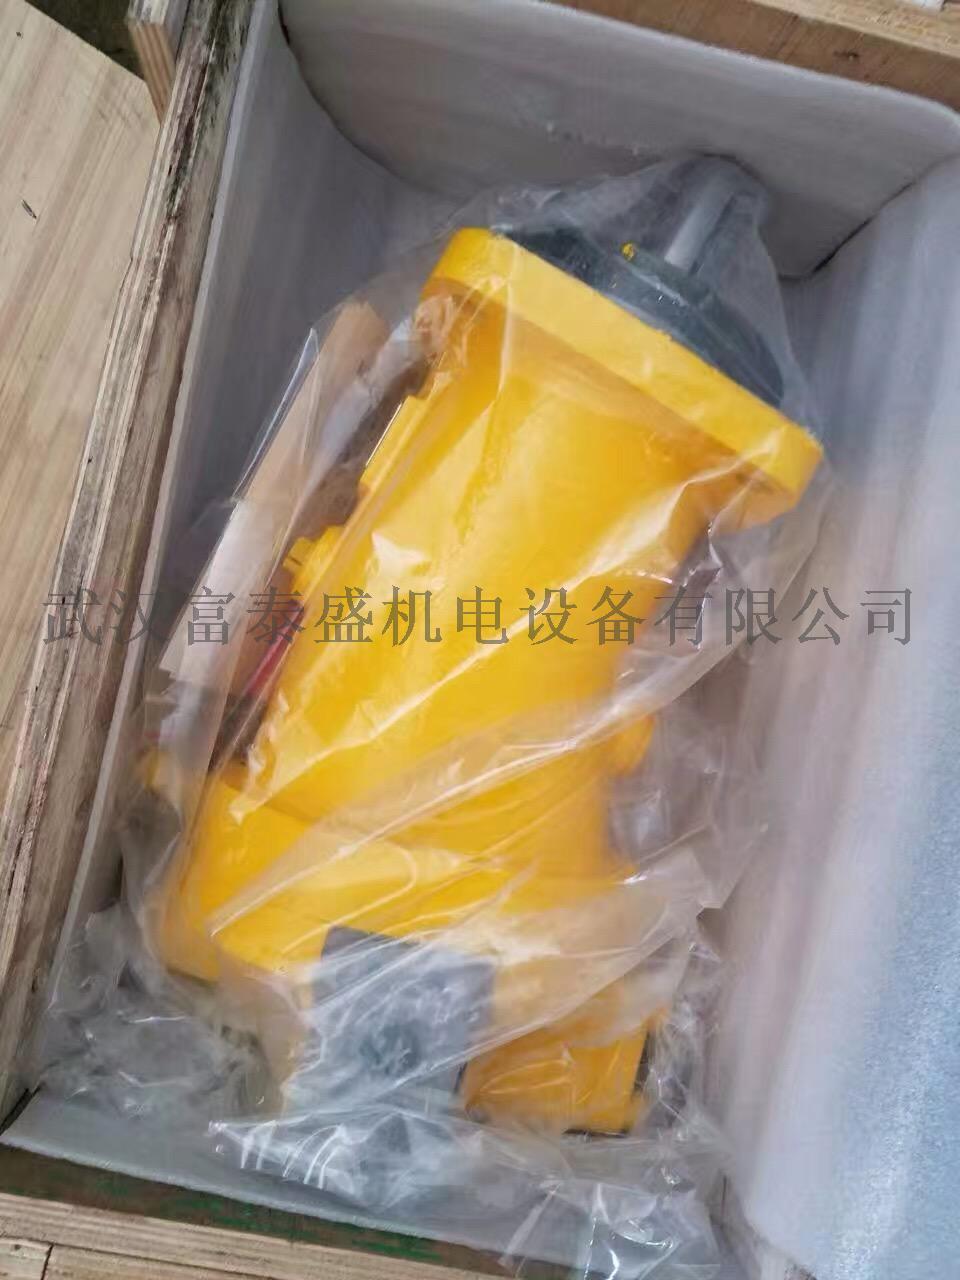 Y-A7V58MA1RPF00 斜轴式柱塞泵厂家